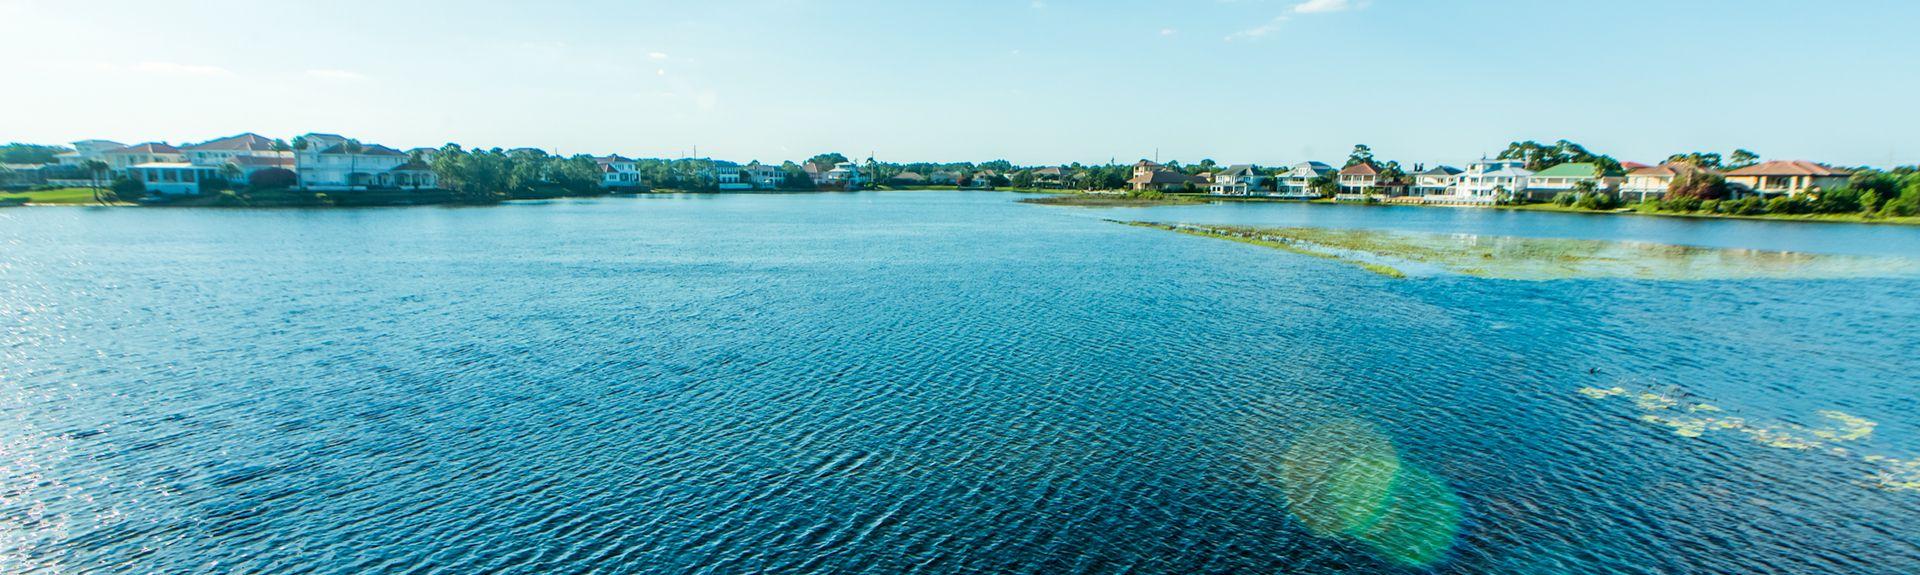 Destiny Beach Villas (Destin, Flórida, Estados Unidos)